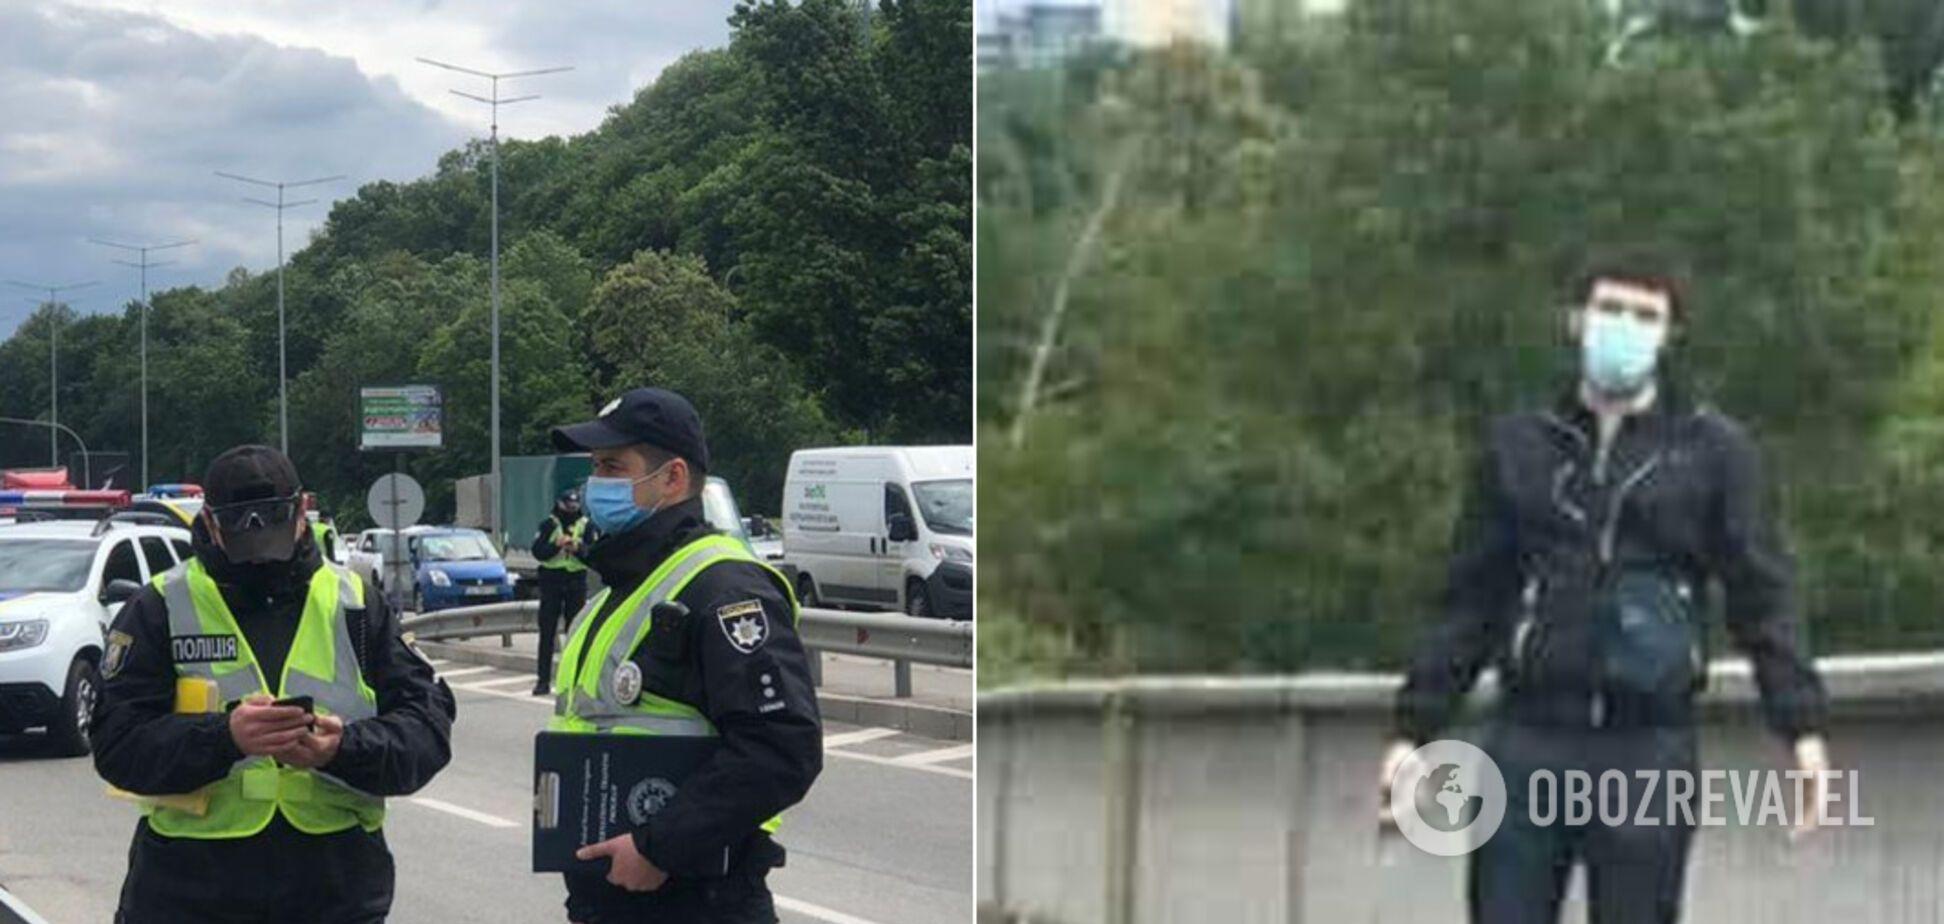 'Минеру' моста в Киеве объявили подозрение